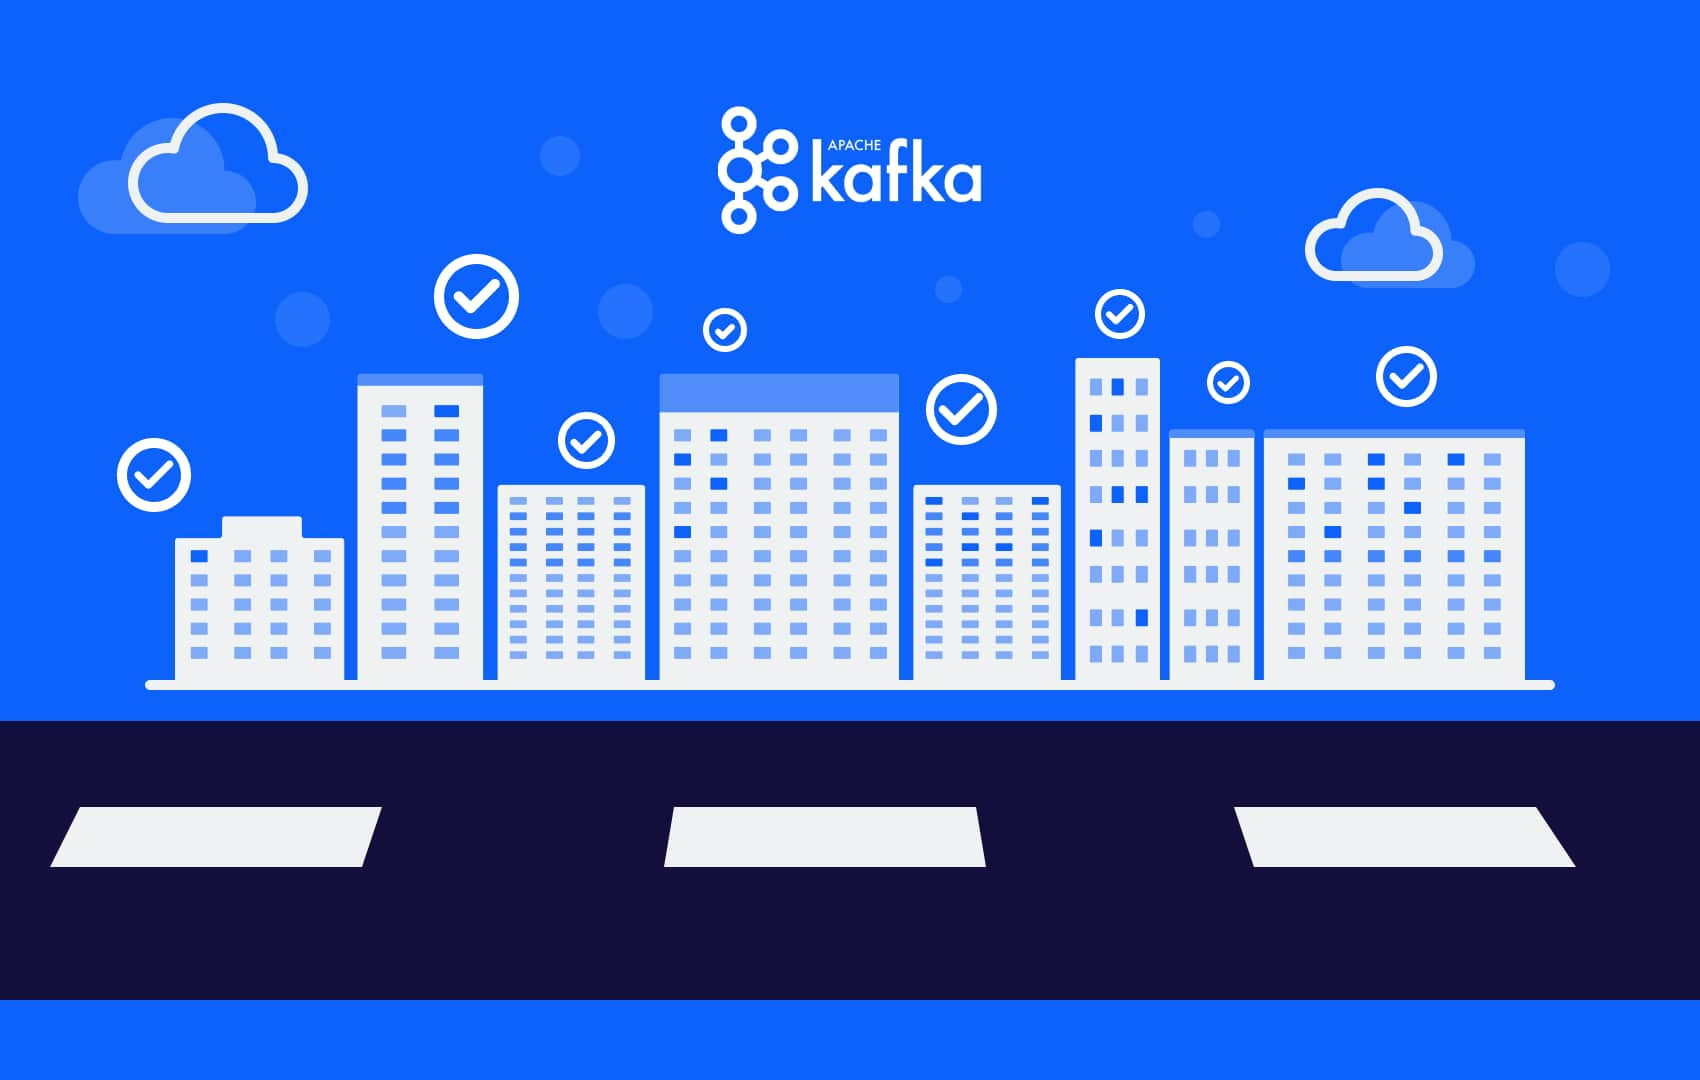 Apache Kafka's Delivery Guarantees